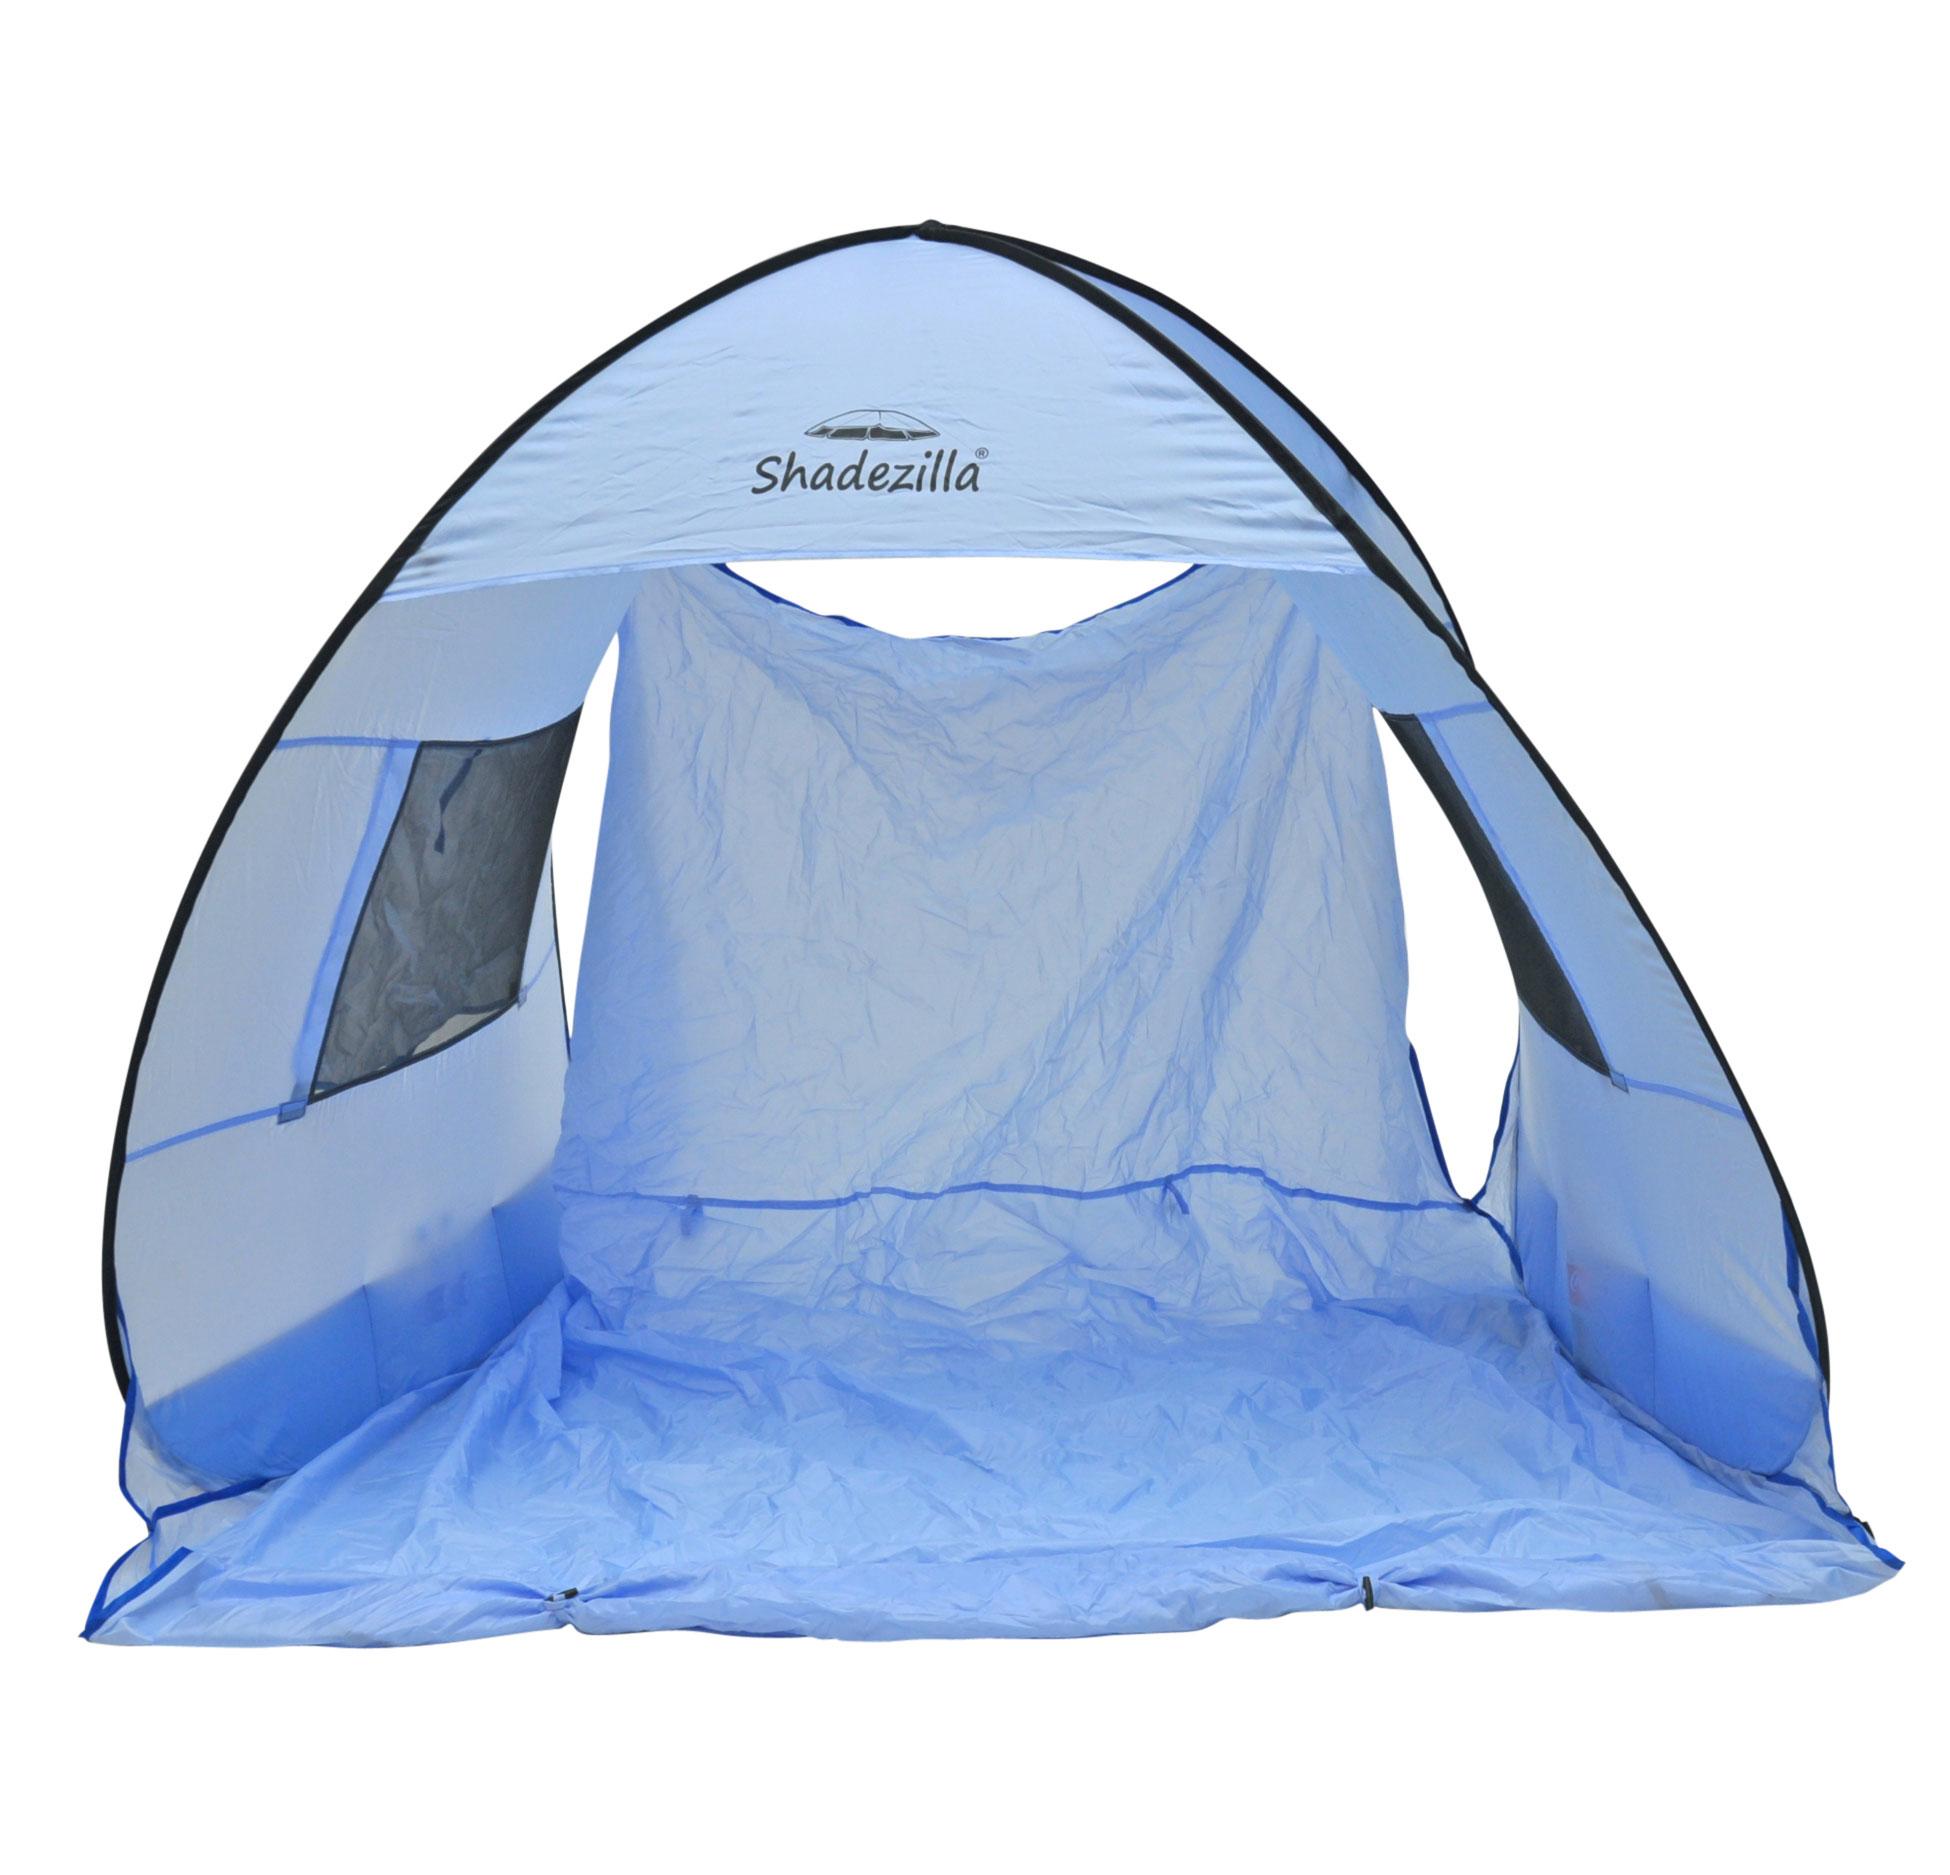 Instant-Pop-up-Family-Beach-Tent-Cabana-Shade-and-Sun-Shelter-UPF-55 thumbnail 6